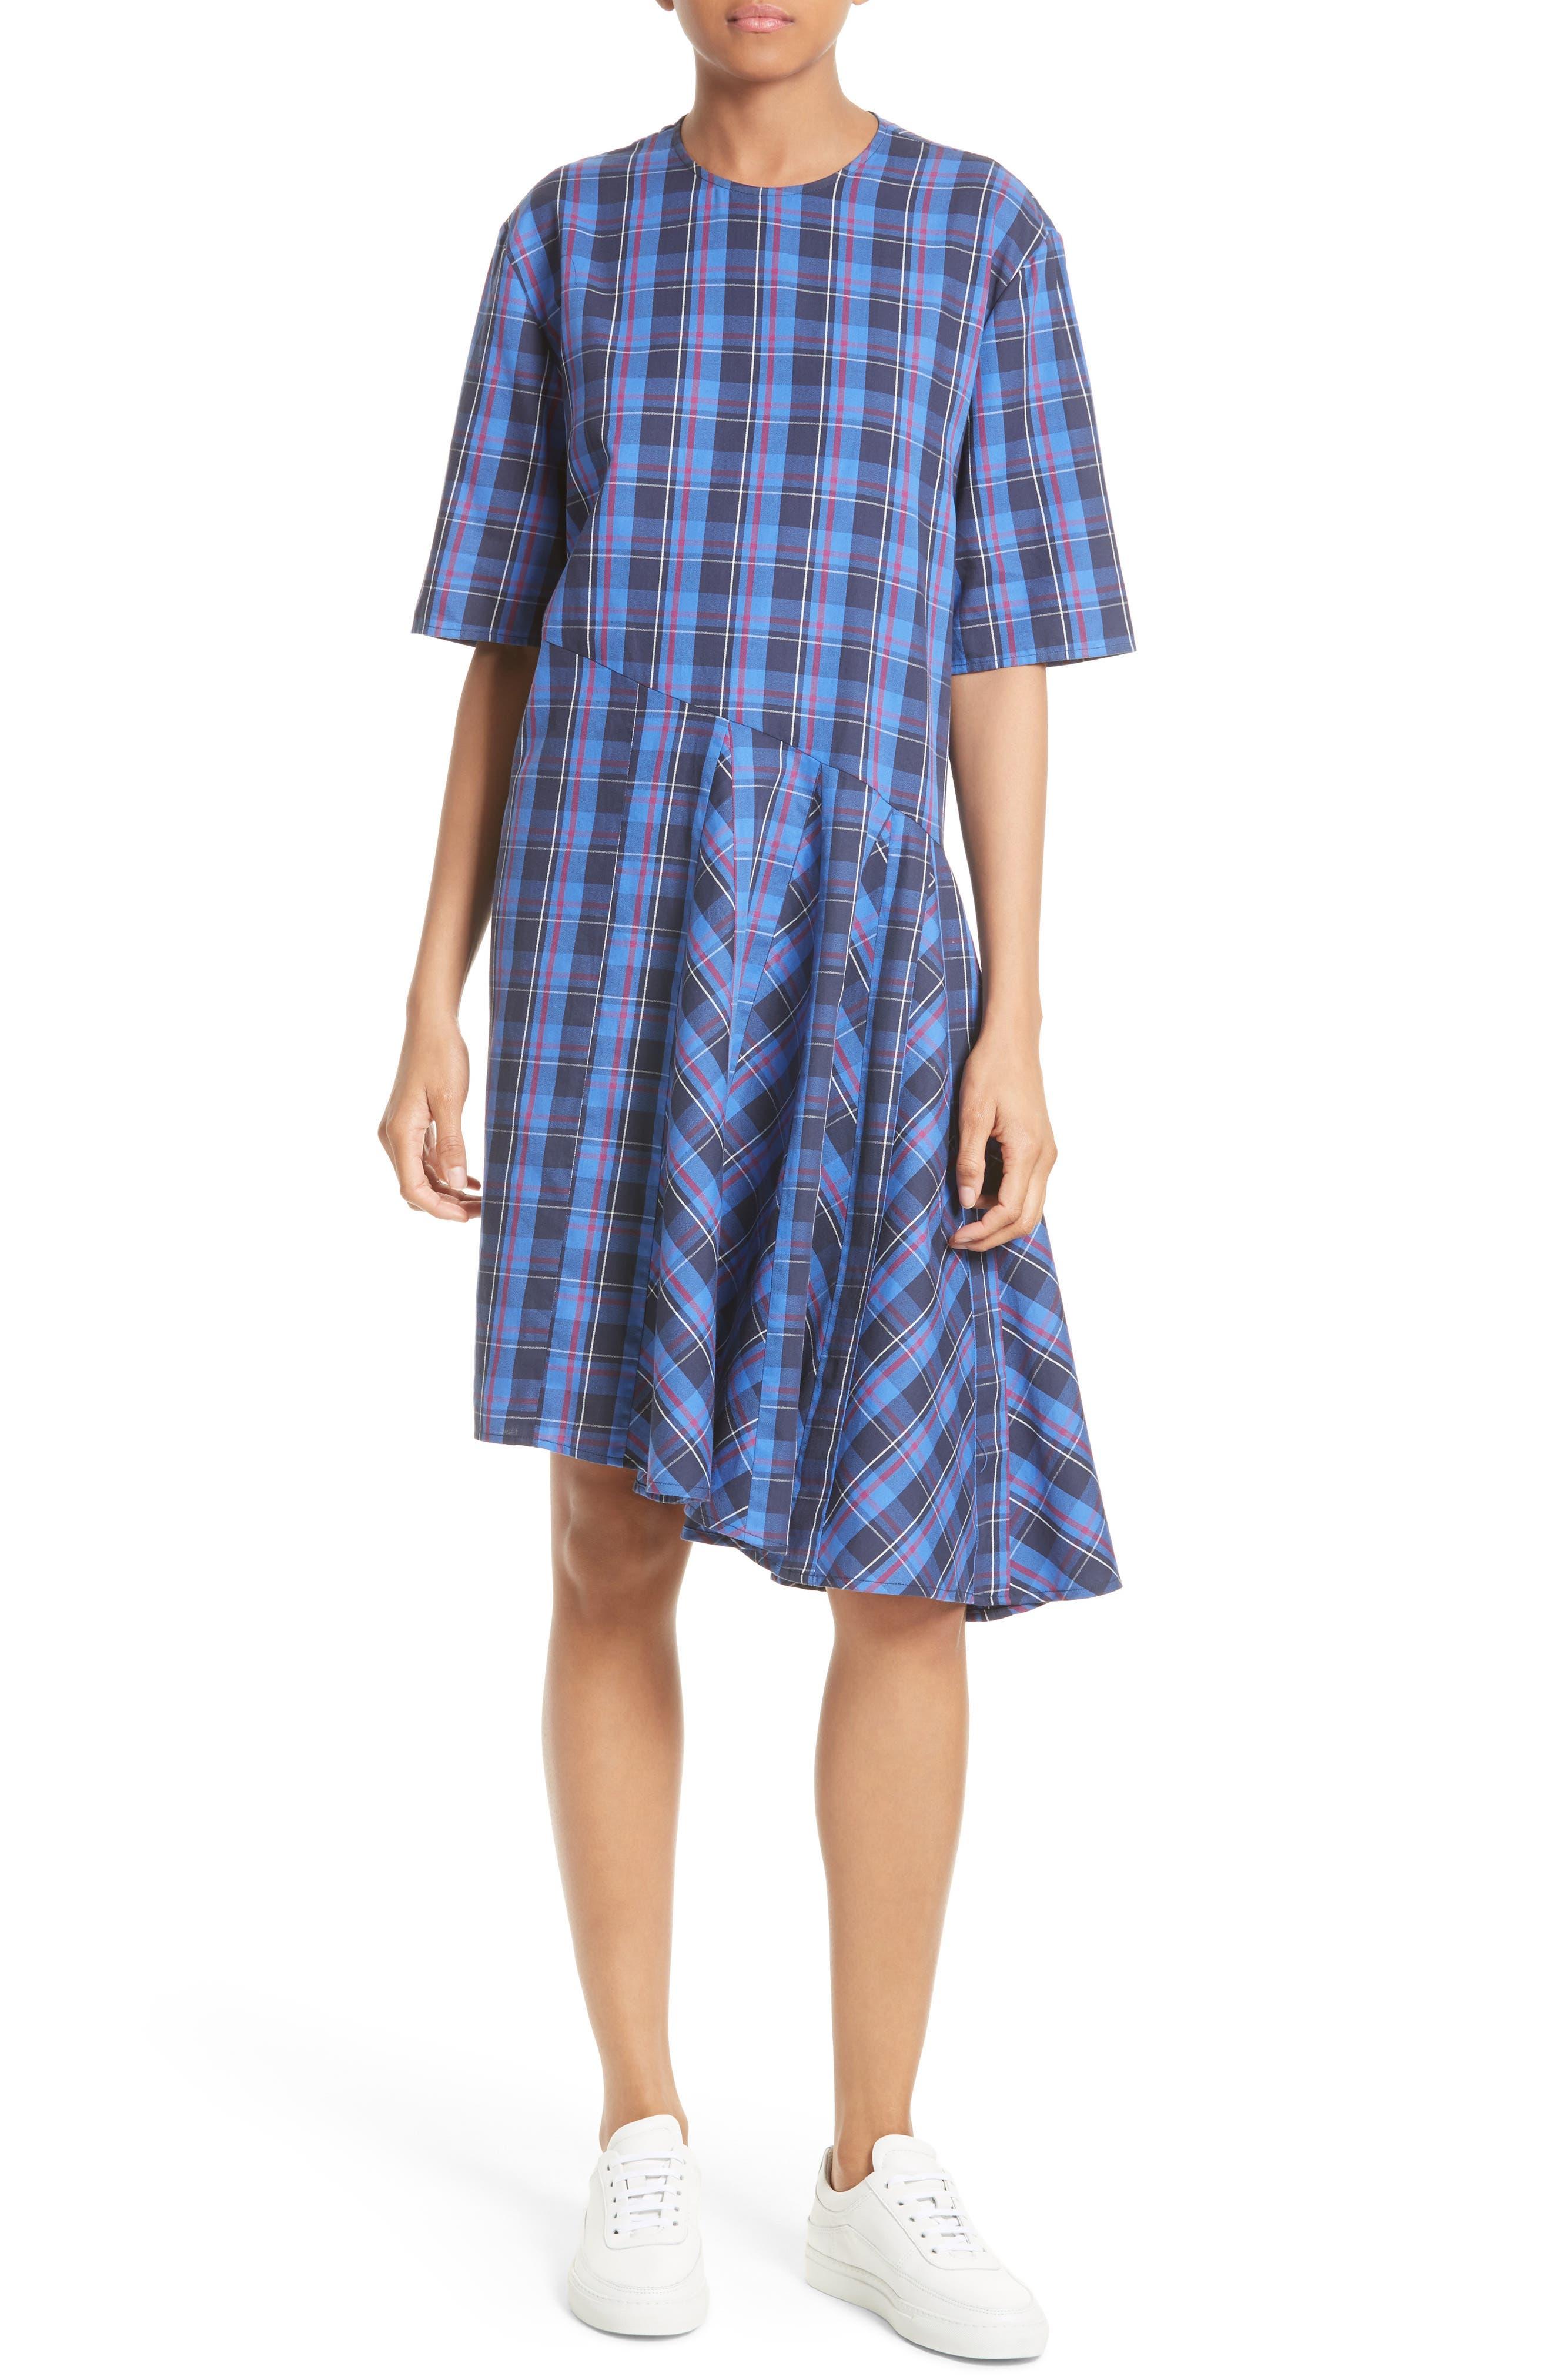 Public School Rima Asymmetrical Plaid Cotton Dress